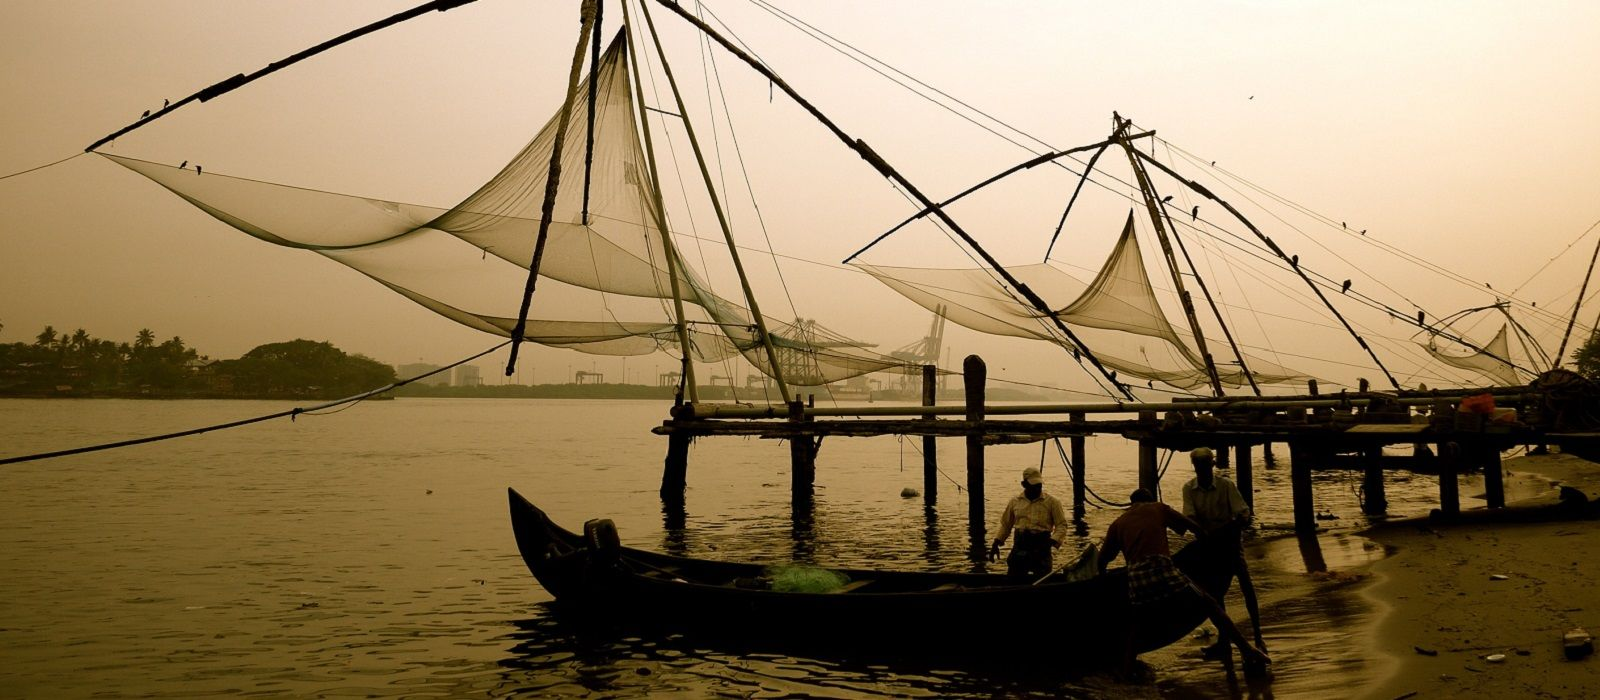 Kerala: Aromen, Traditionen & tropische Träume Urlaub 4